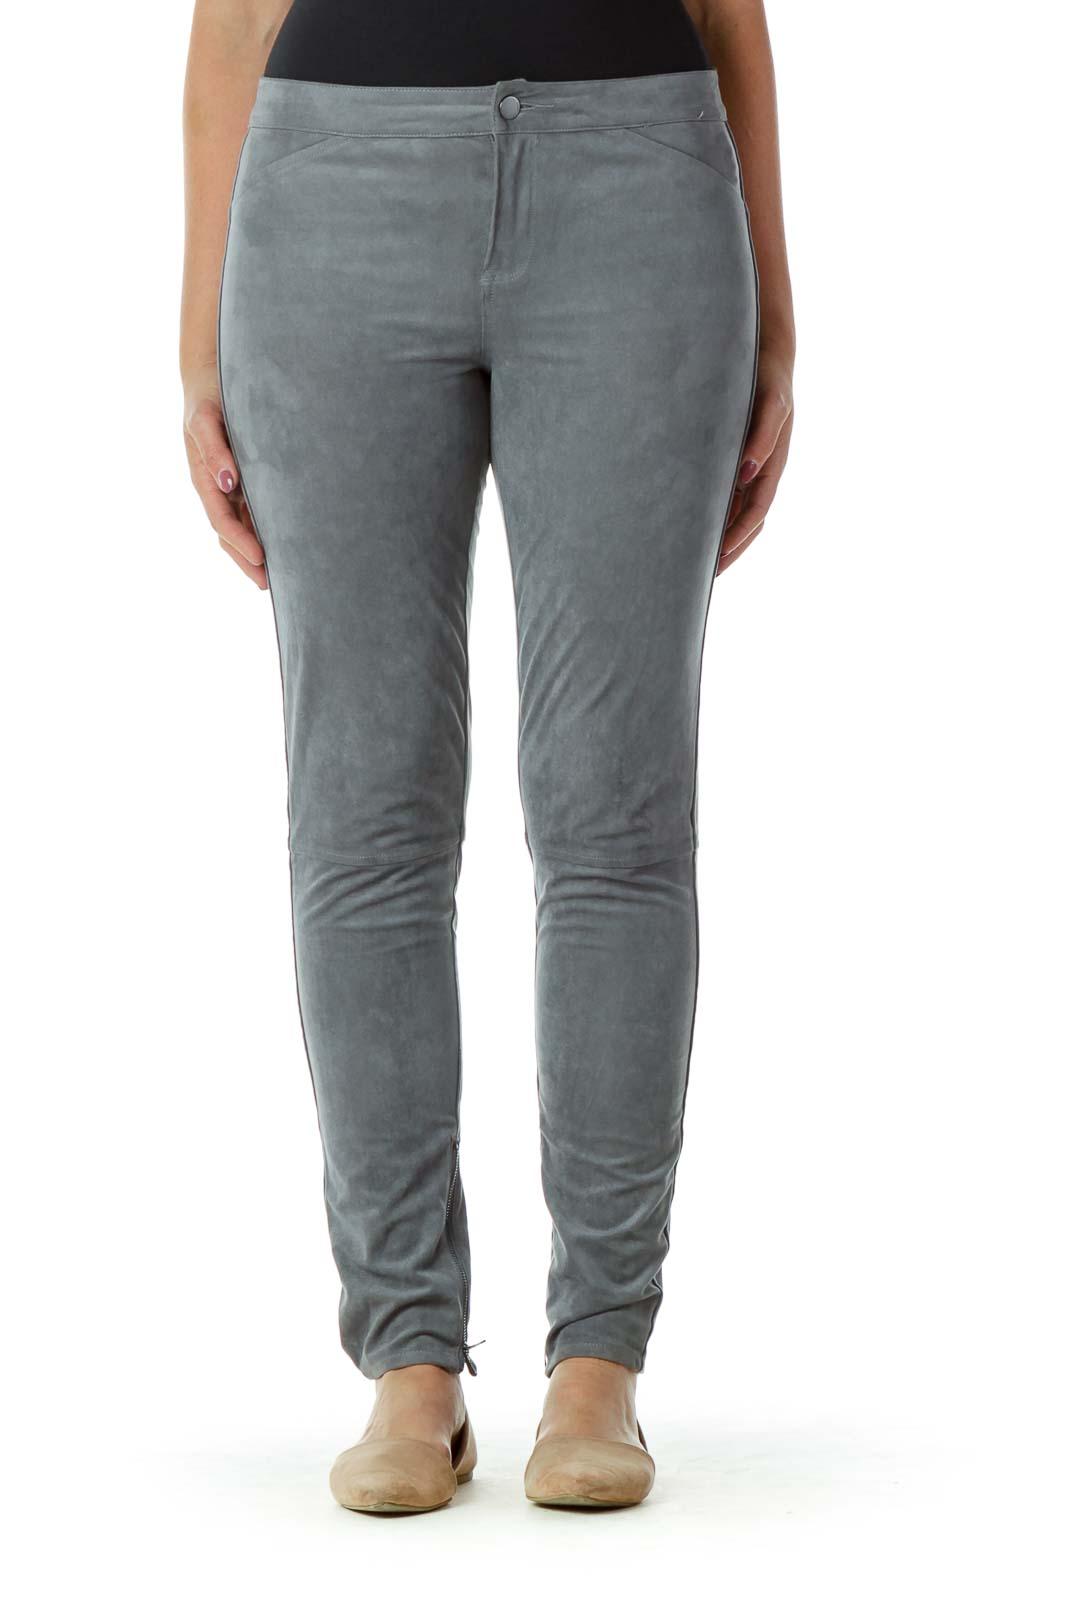 Gray Suede Skinny Zipper Leg Pants